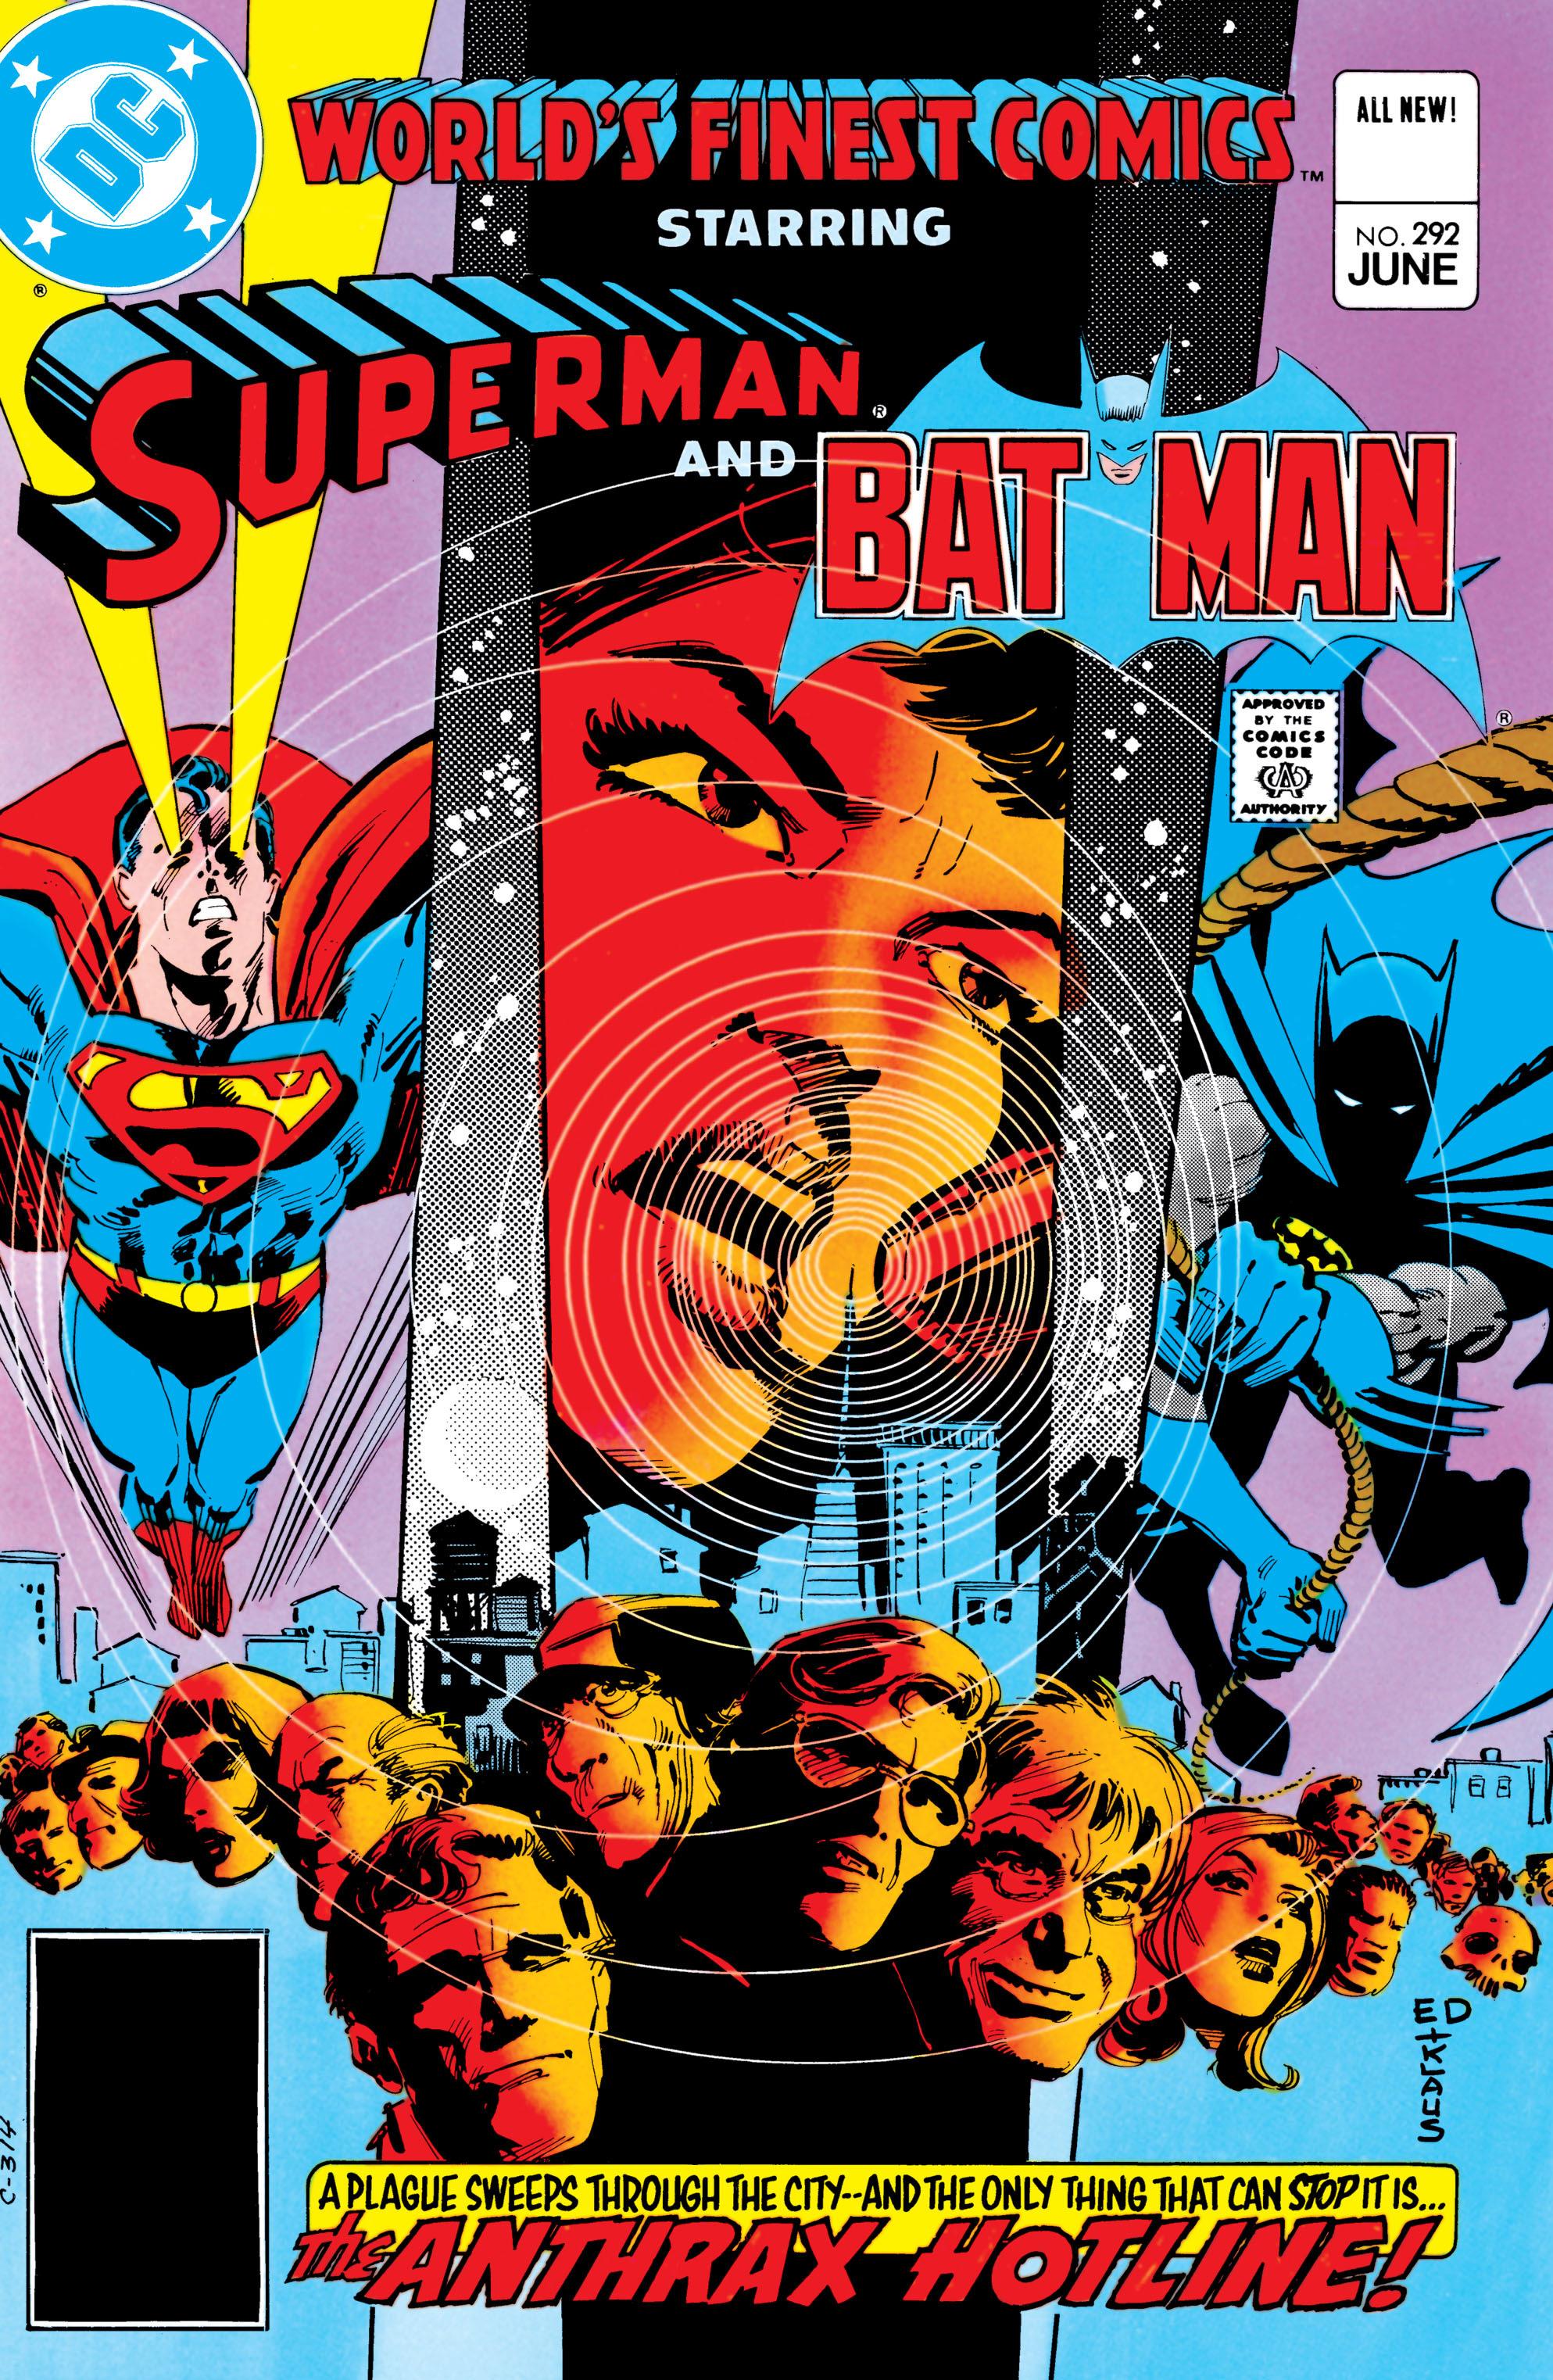 Read online World's Finest Comics comic -  Issue #292 - 1